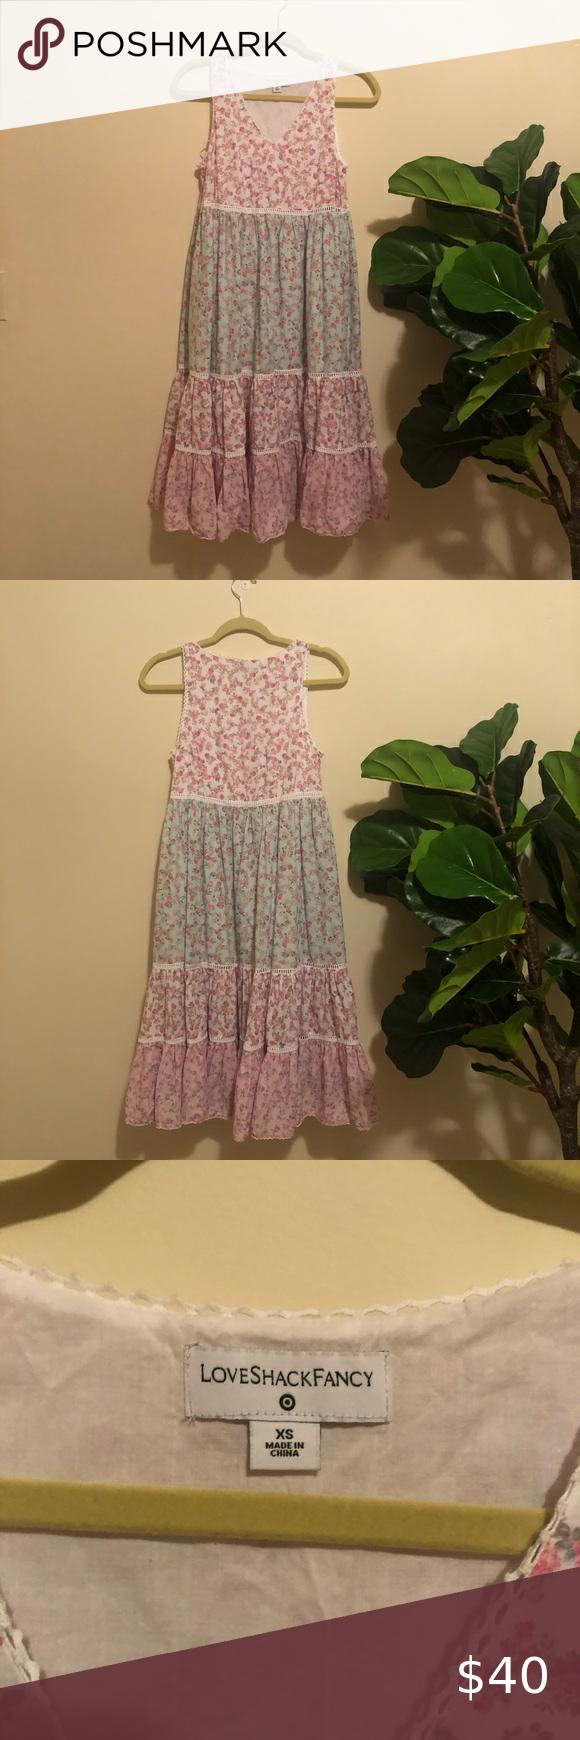 Loveshackfancy For Target Midi Dress In 2020 Loveshackfancy Midi Dress Dresses [ 1740 x 580 Pixel ]